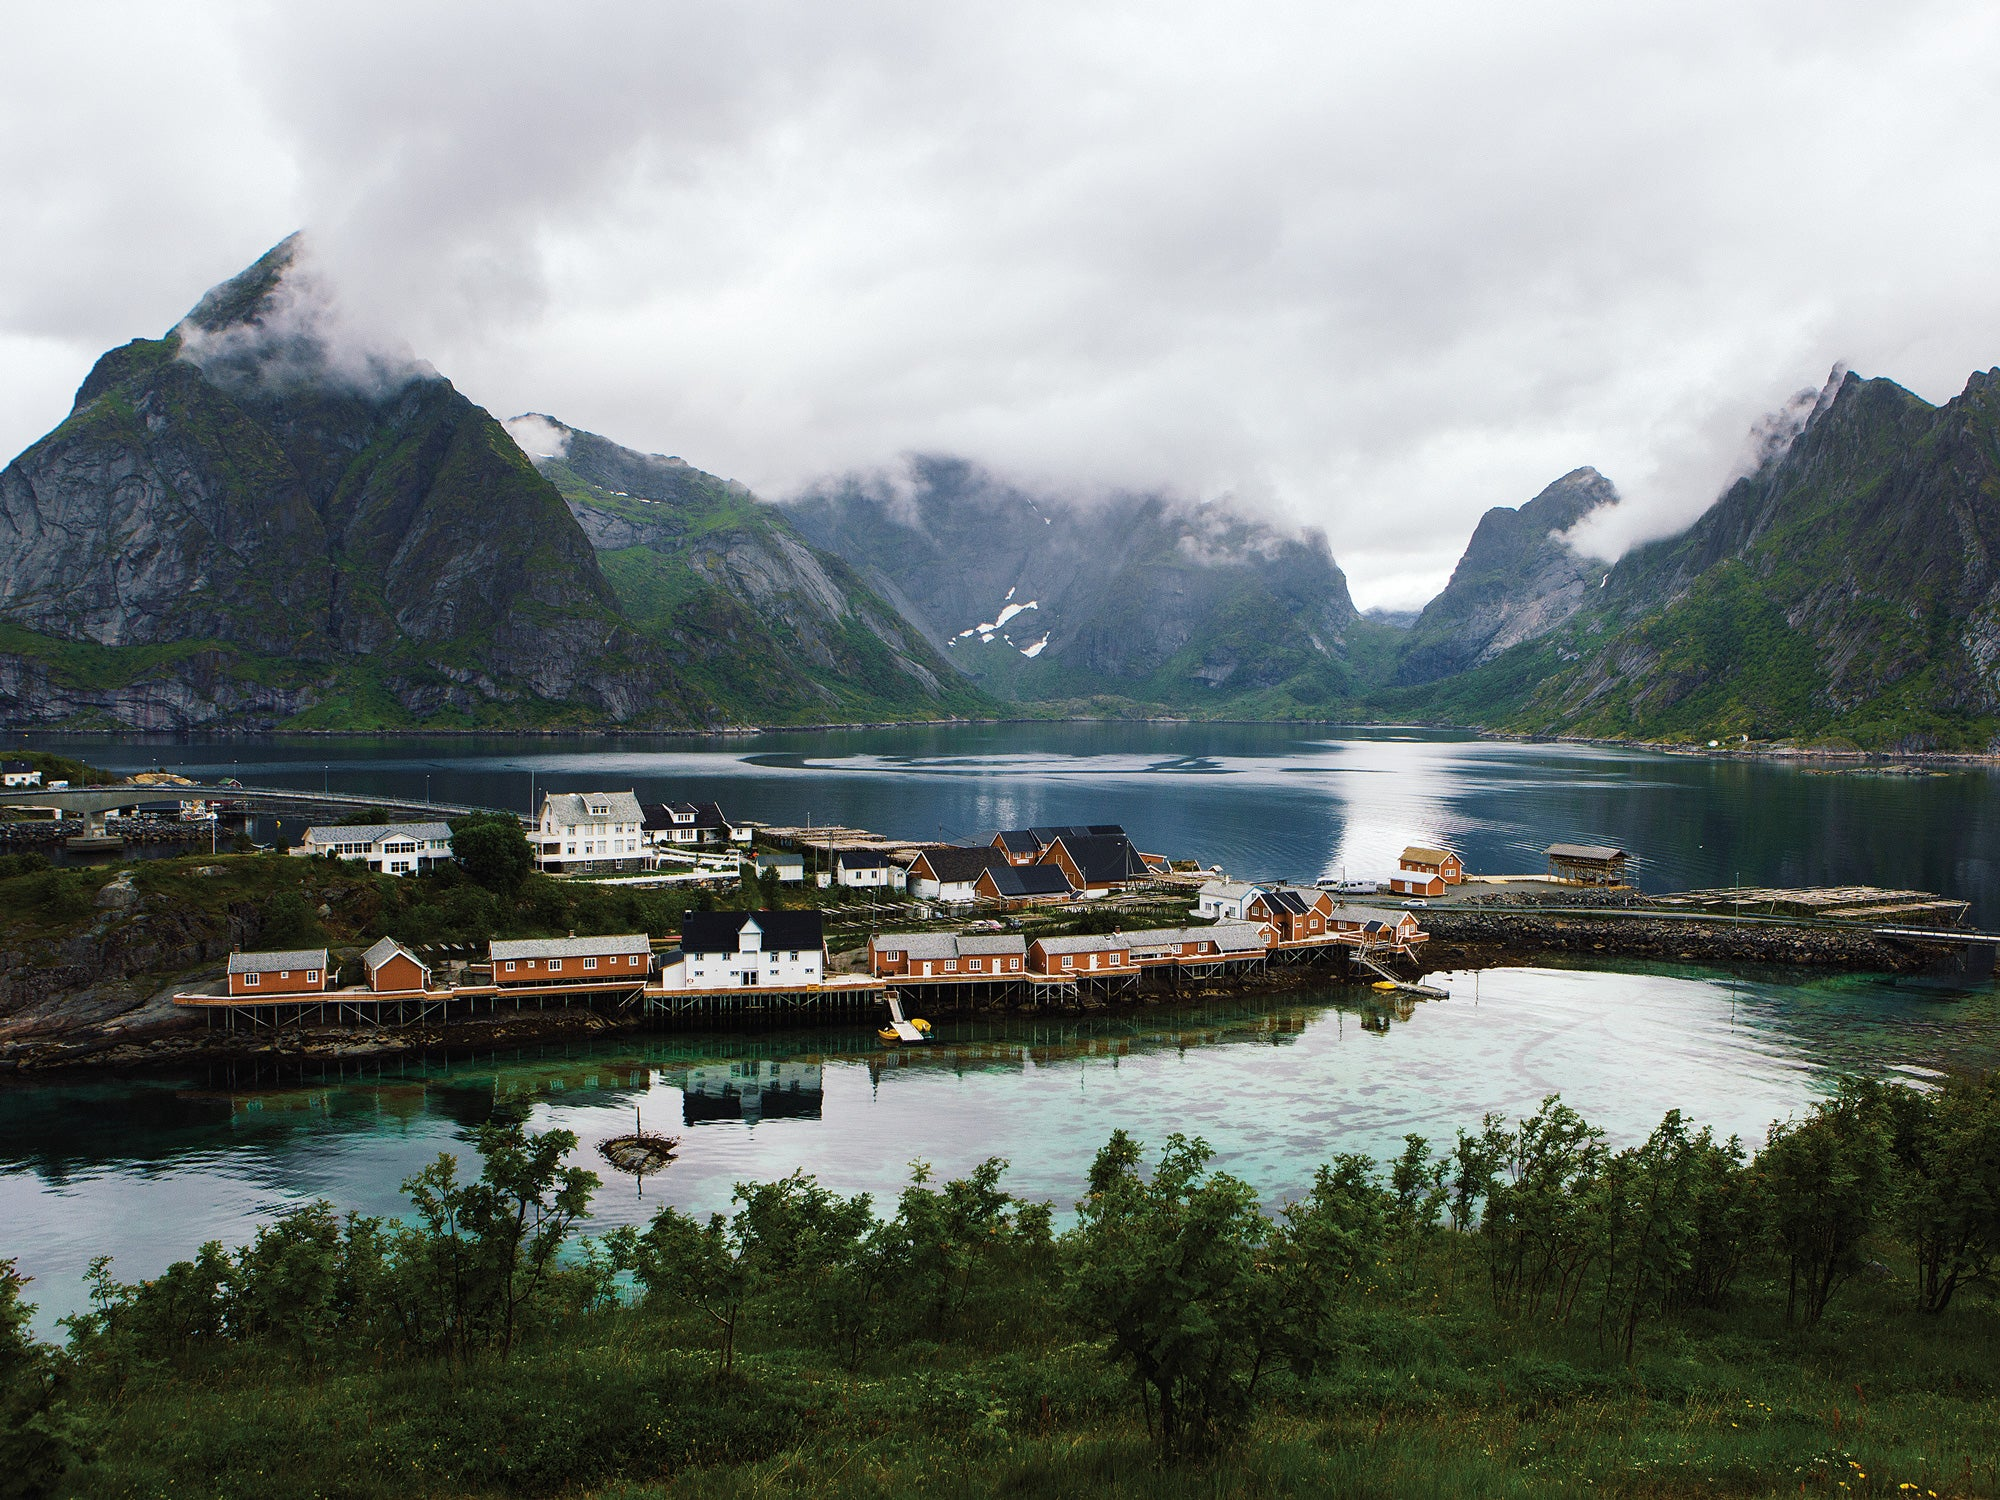 The remote archipelago of the Lofoten Islands, Norway